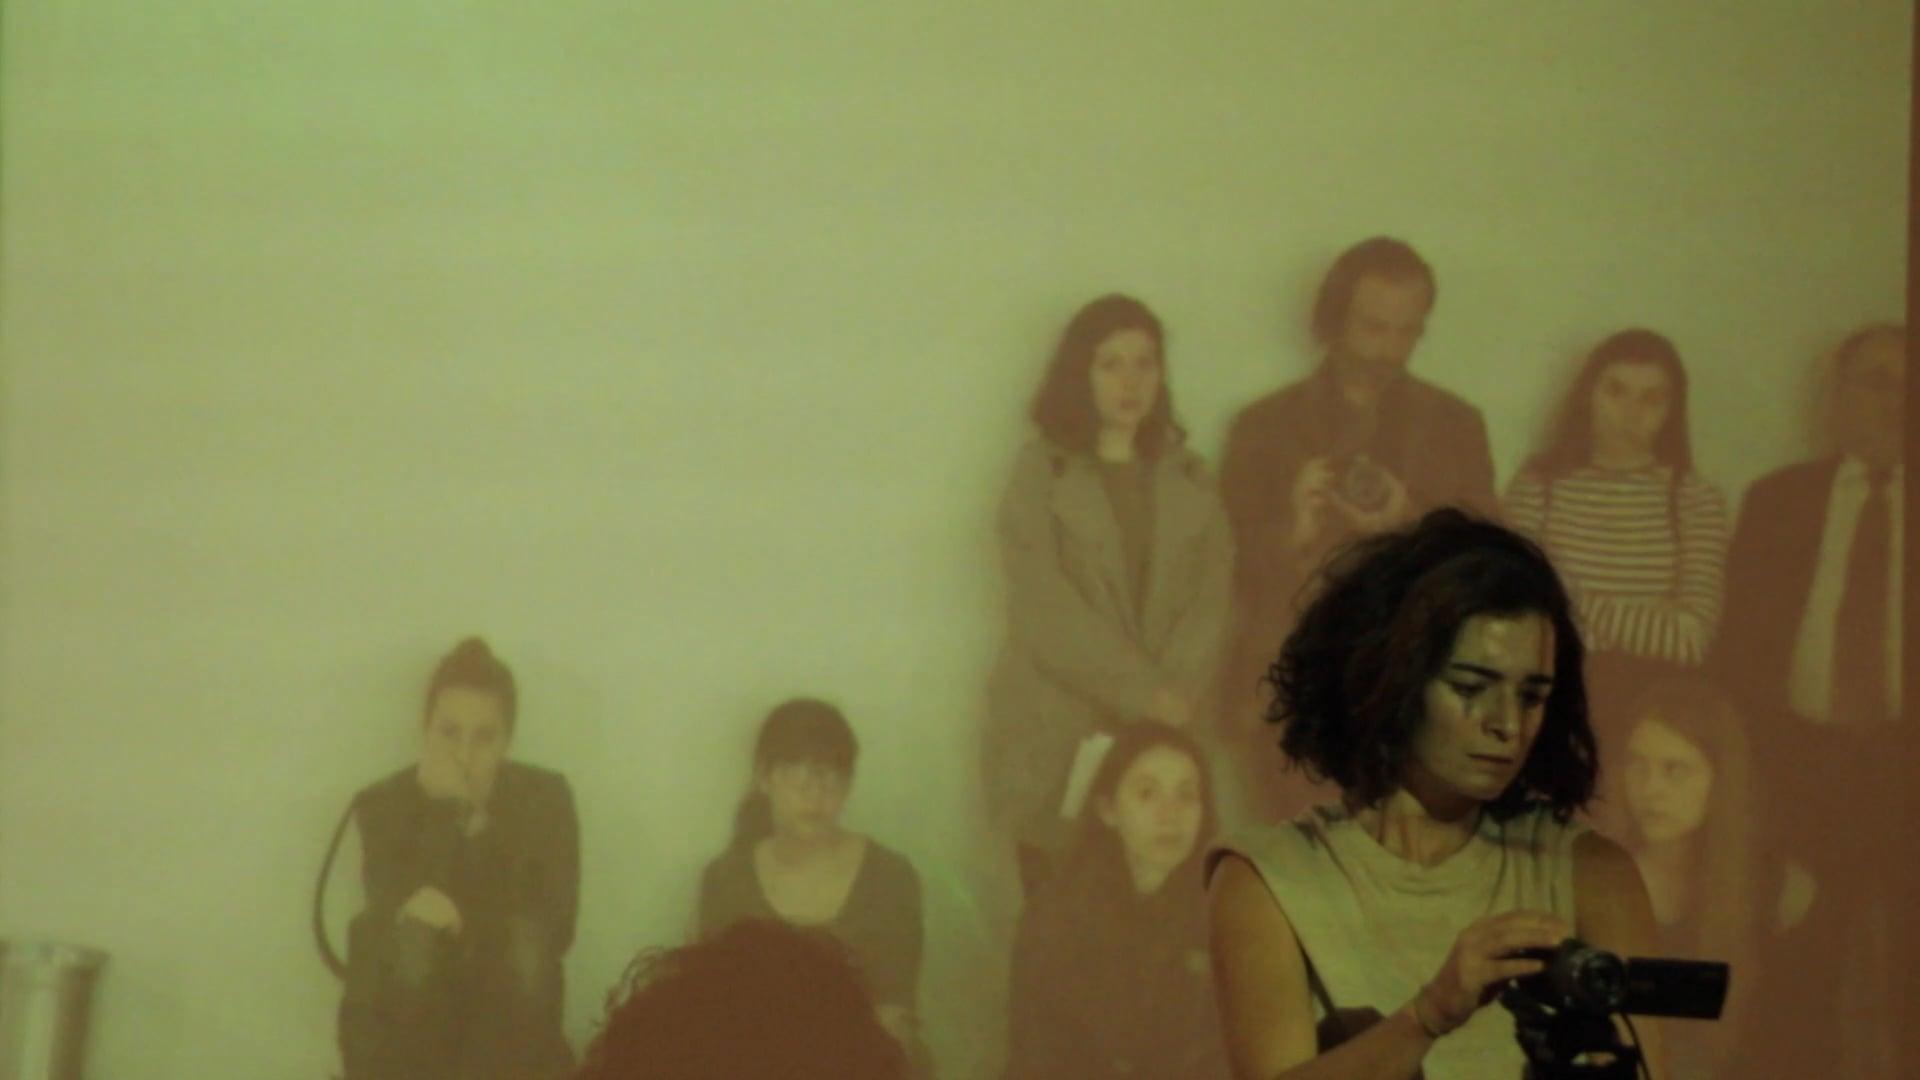 Performance at Benaki Museum. Winter 2016.